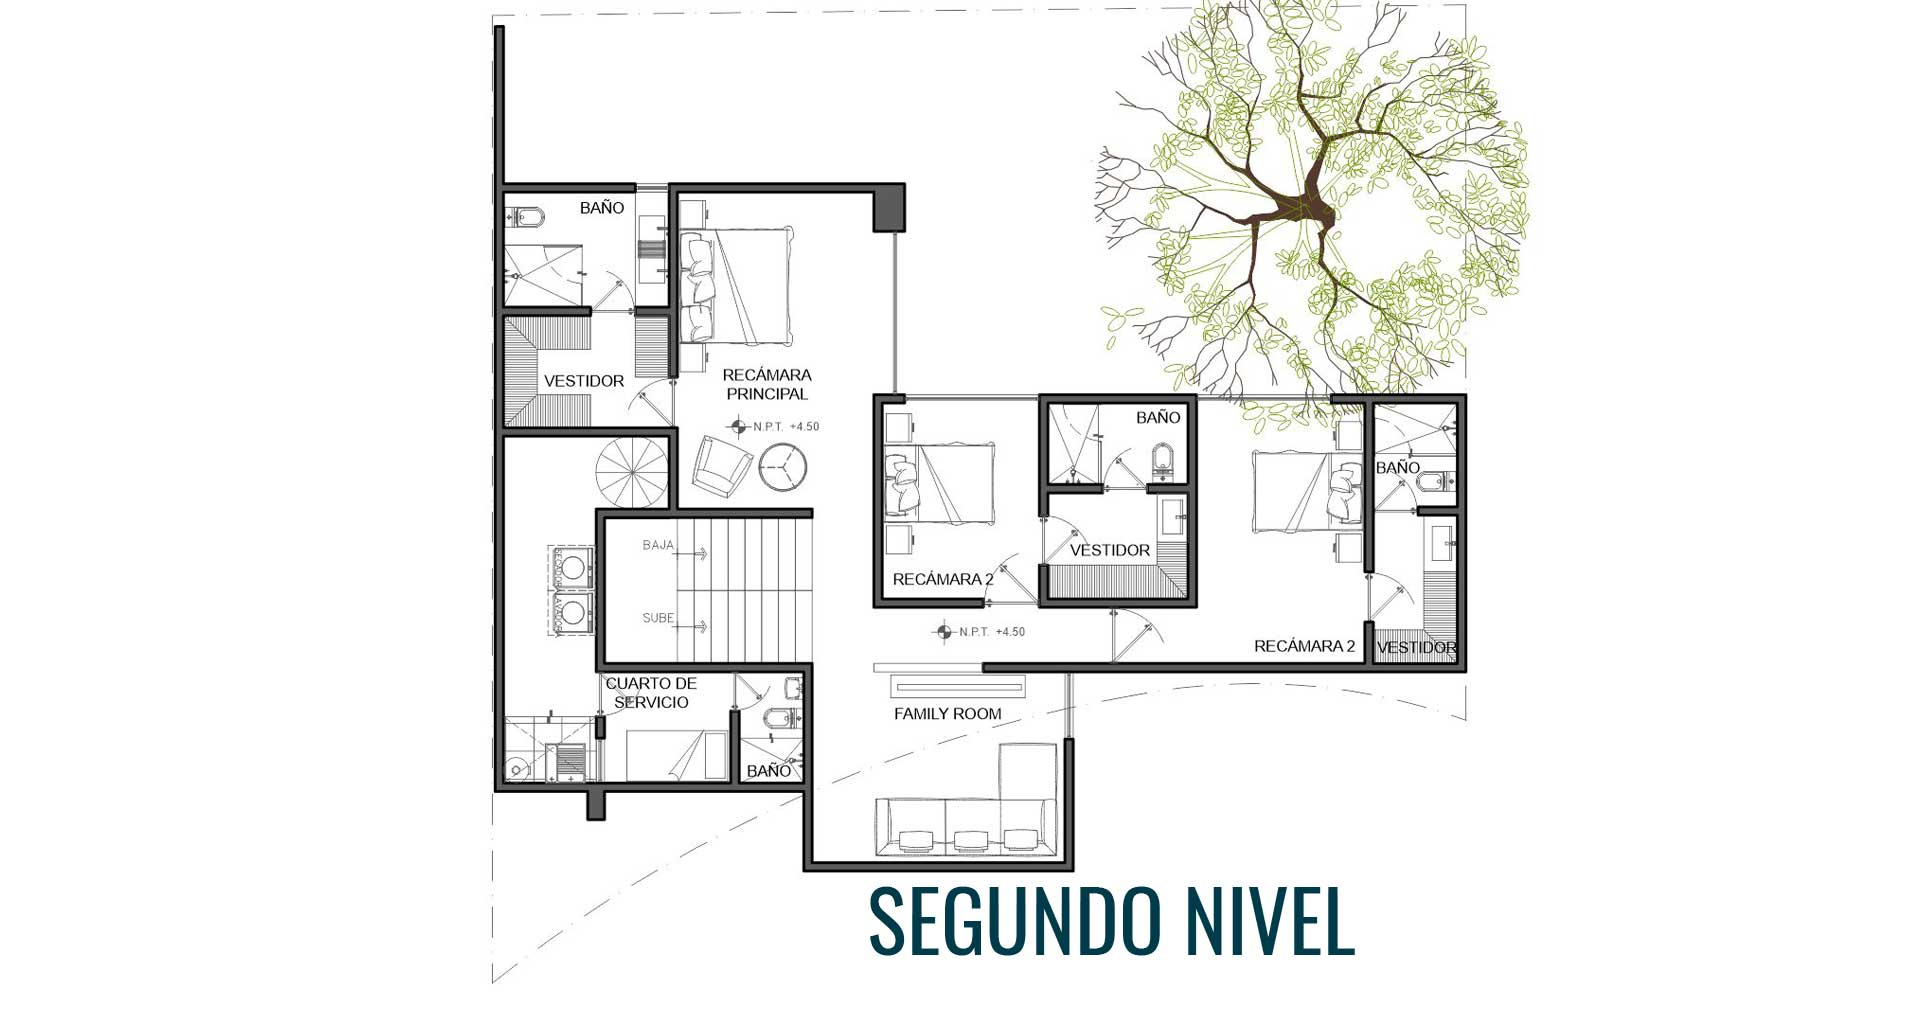 Margaritas 339 residencial Mexihom Residencia 3 segundo nivel